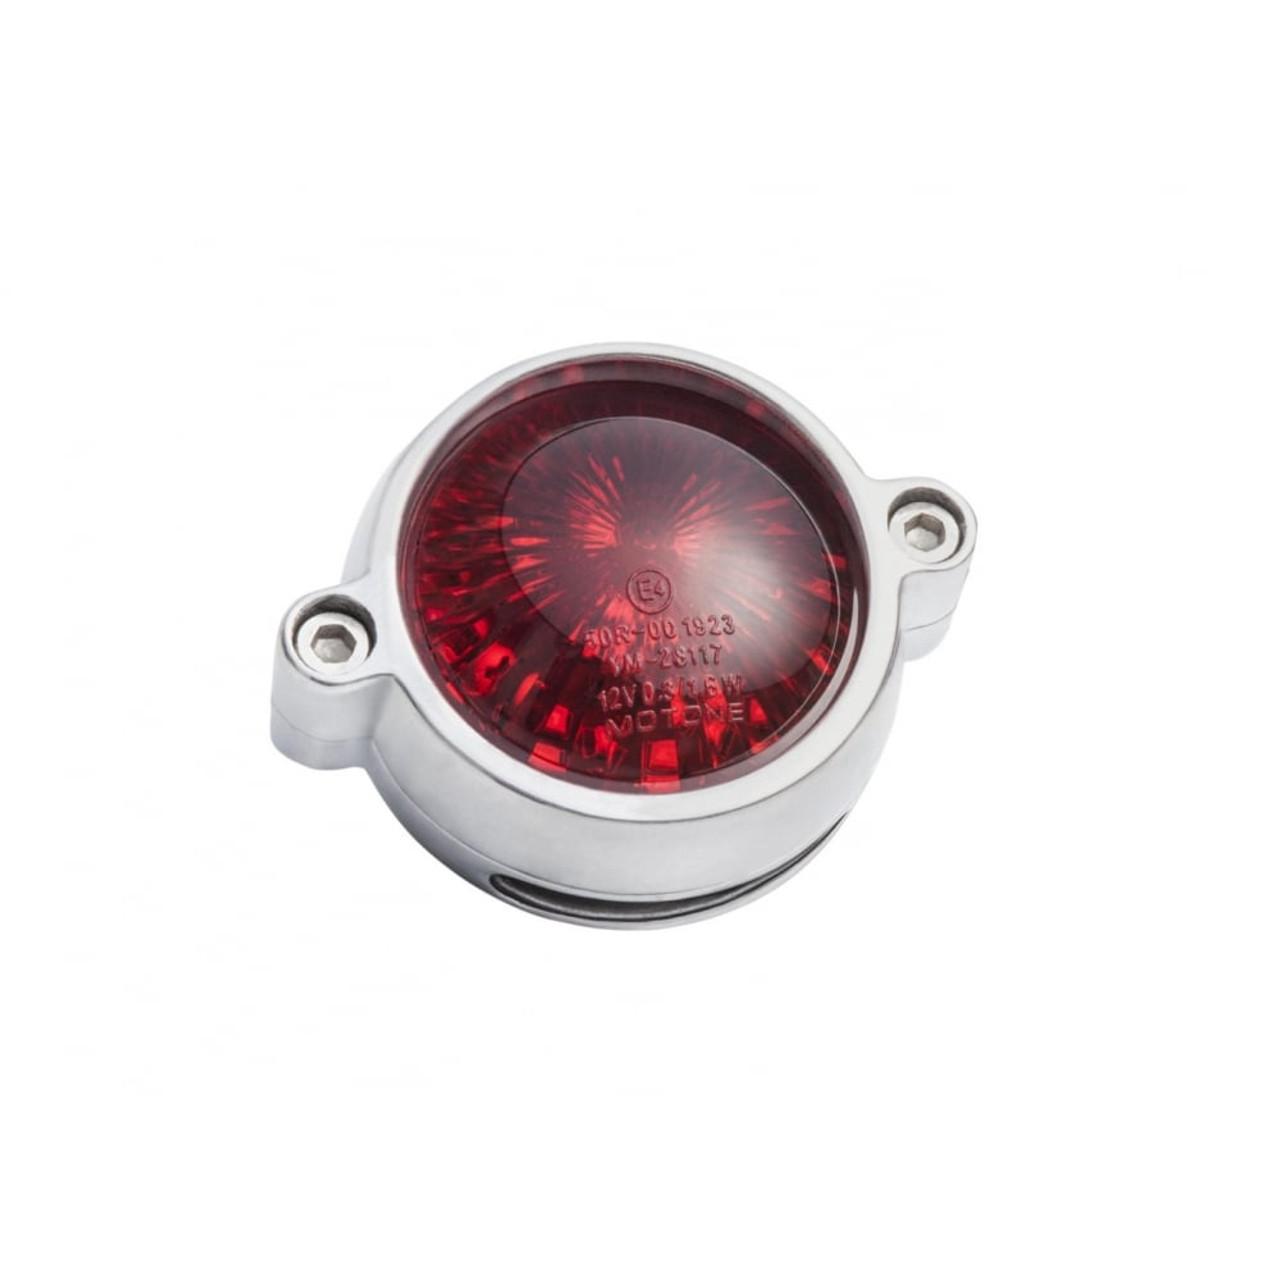 Eldorado Tail Light - LED - Polished